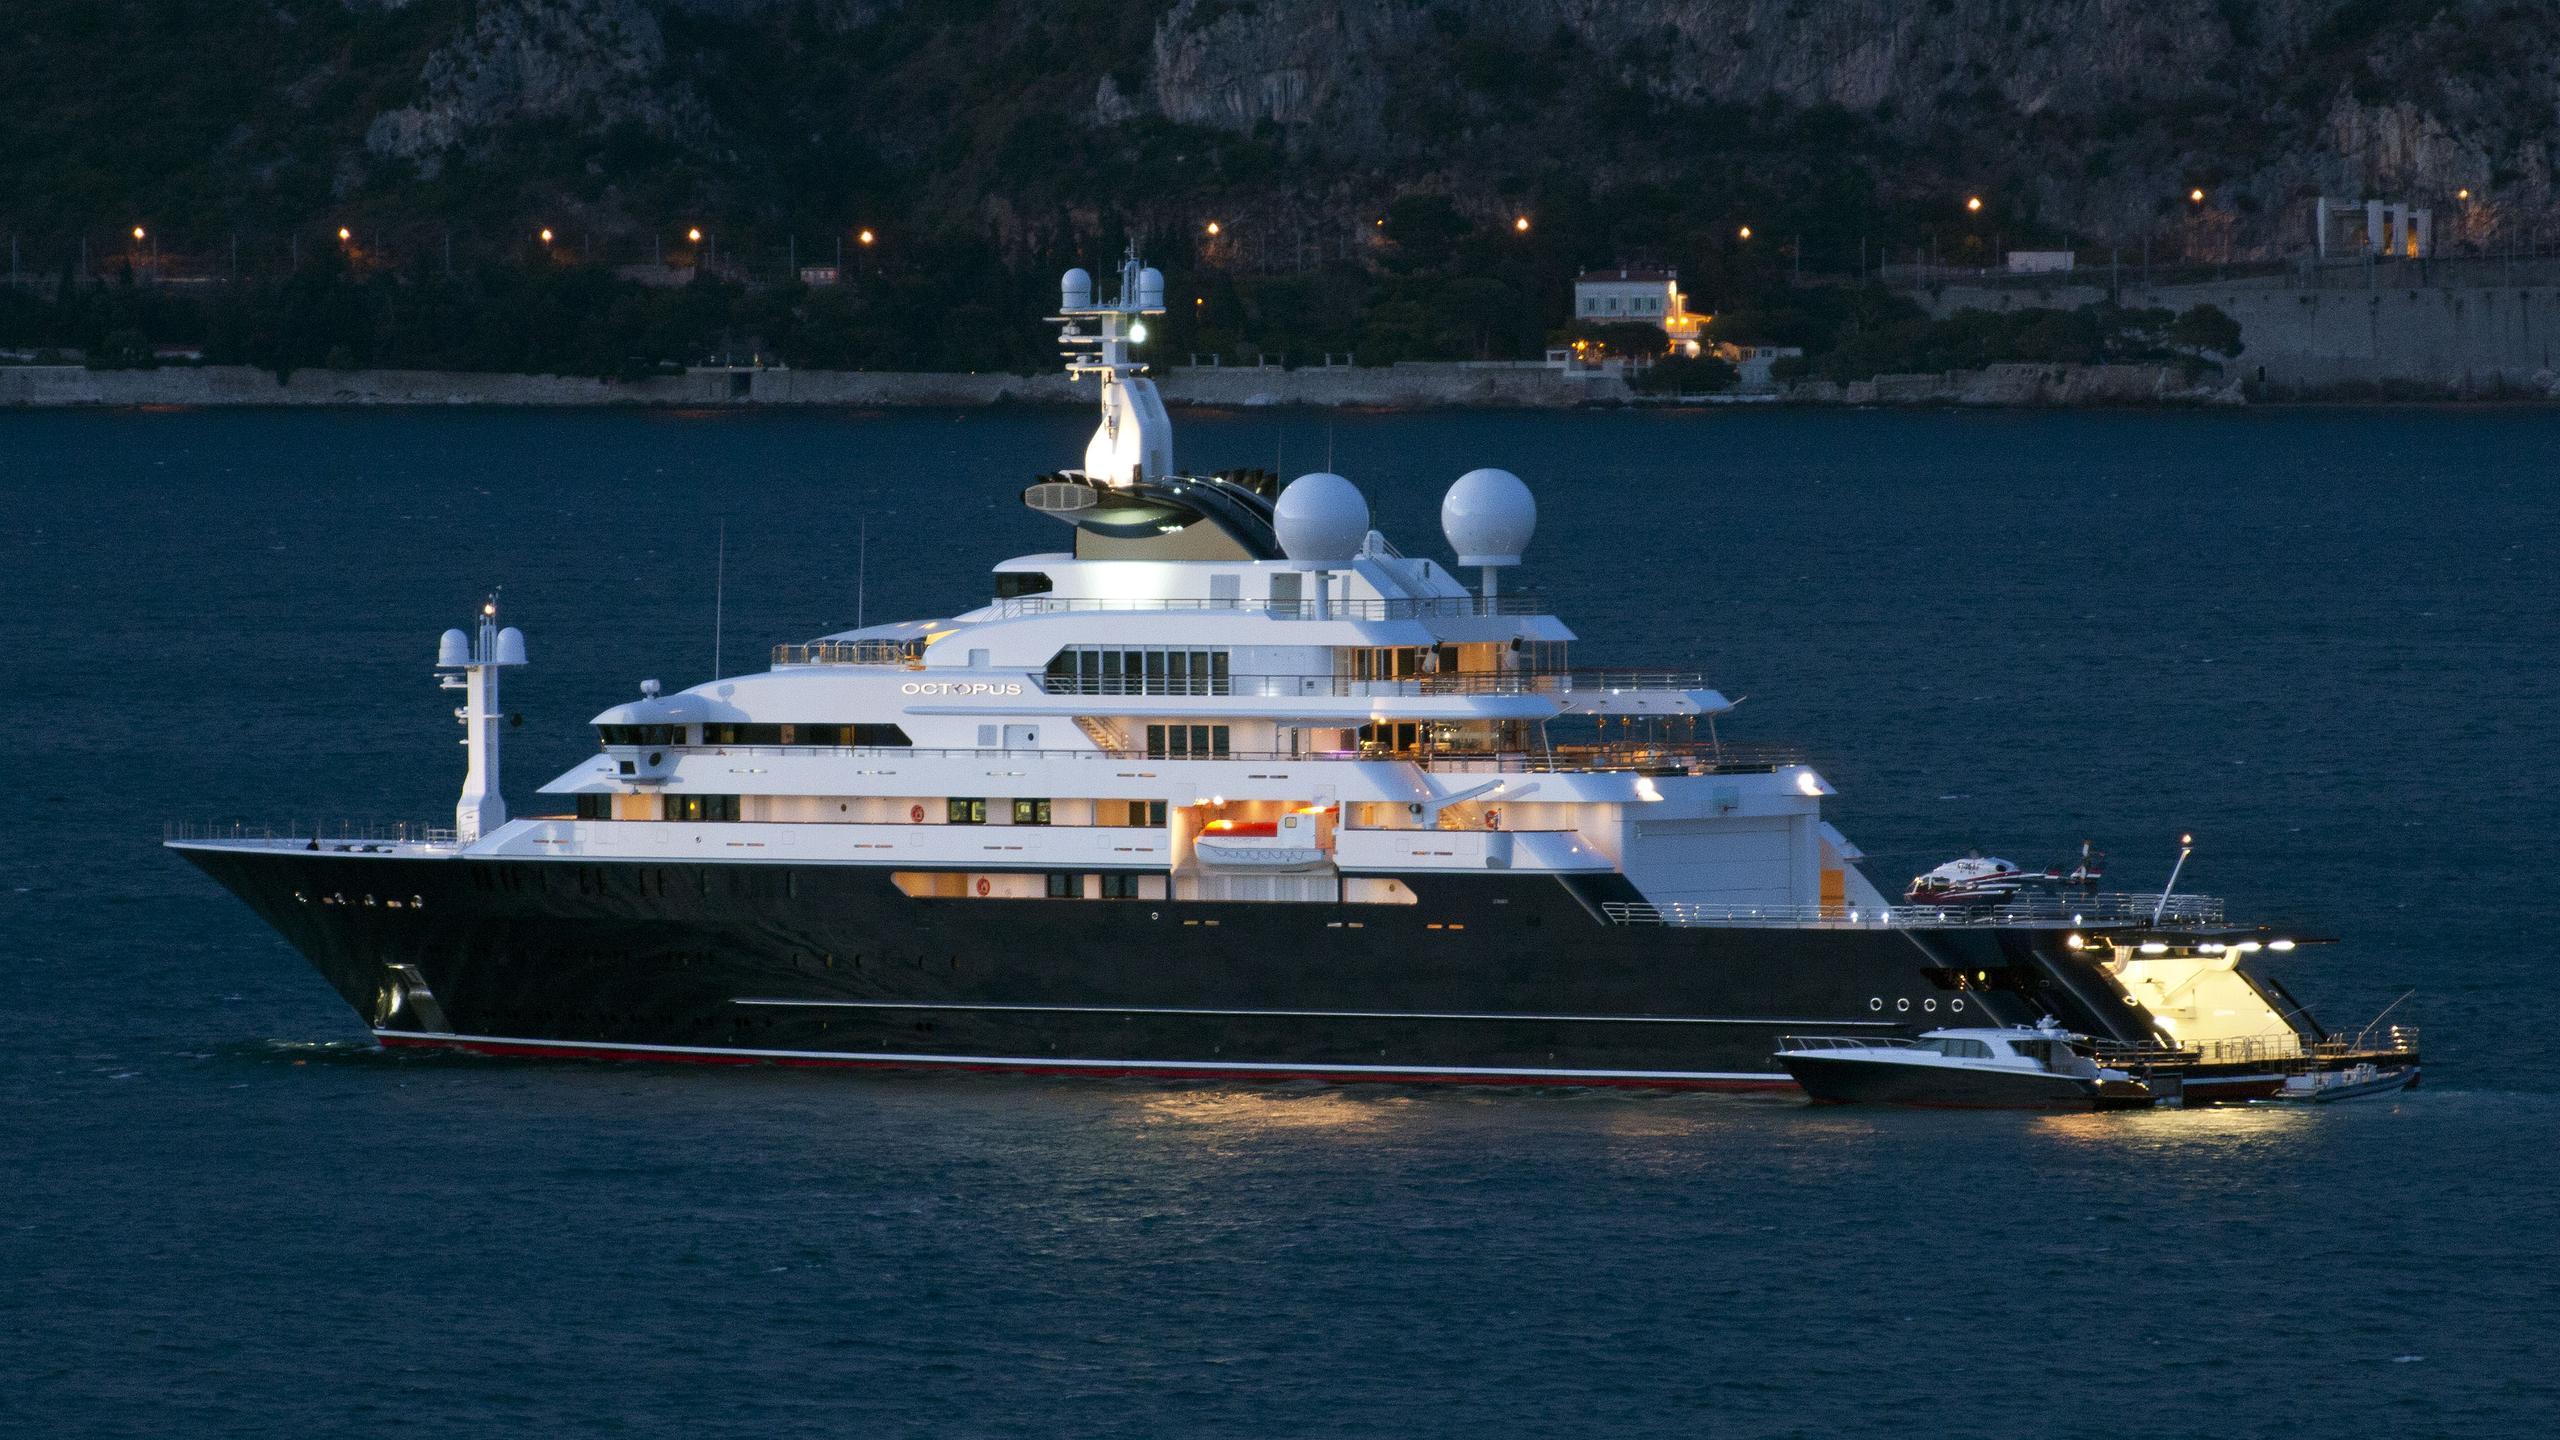 octopus-explorer-yacht-lurssen-2003-126m-profile-by-night